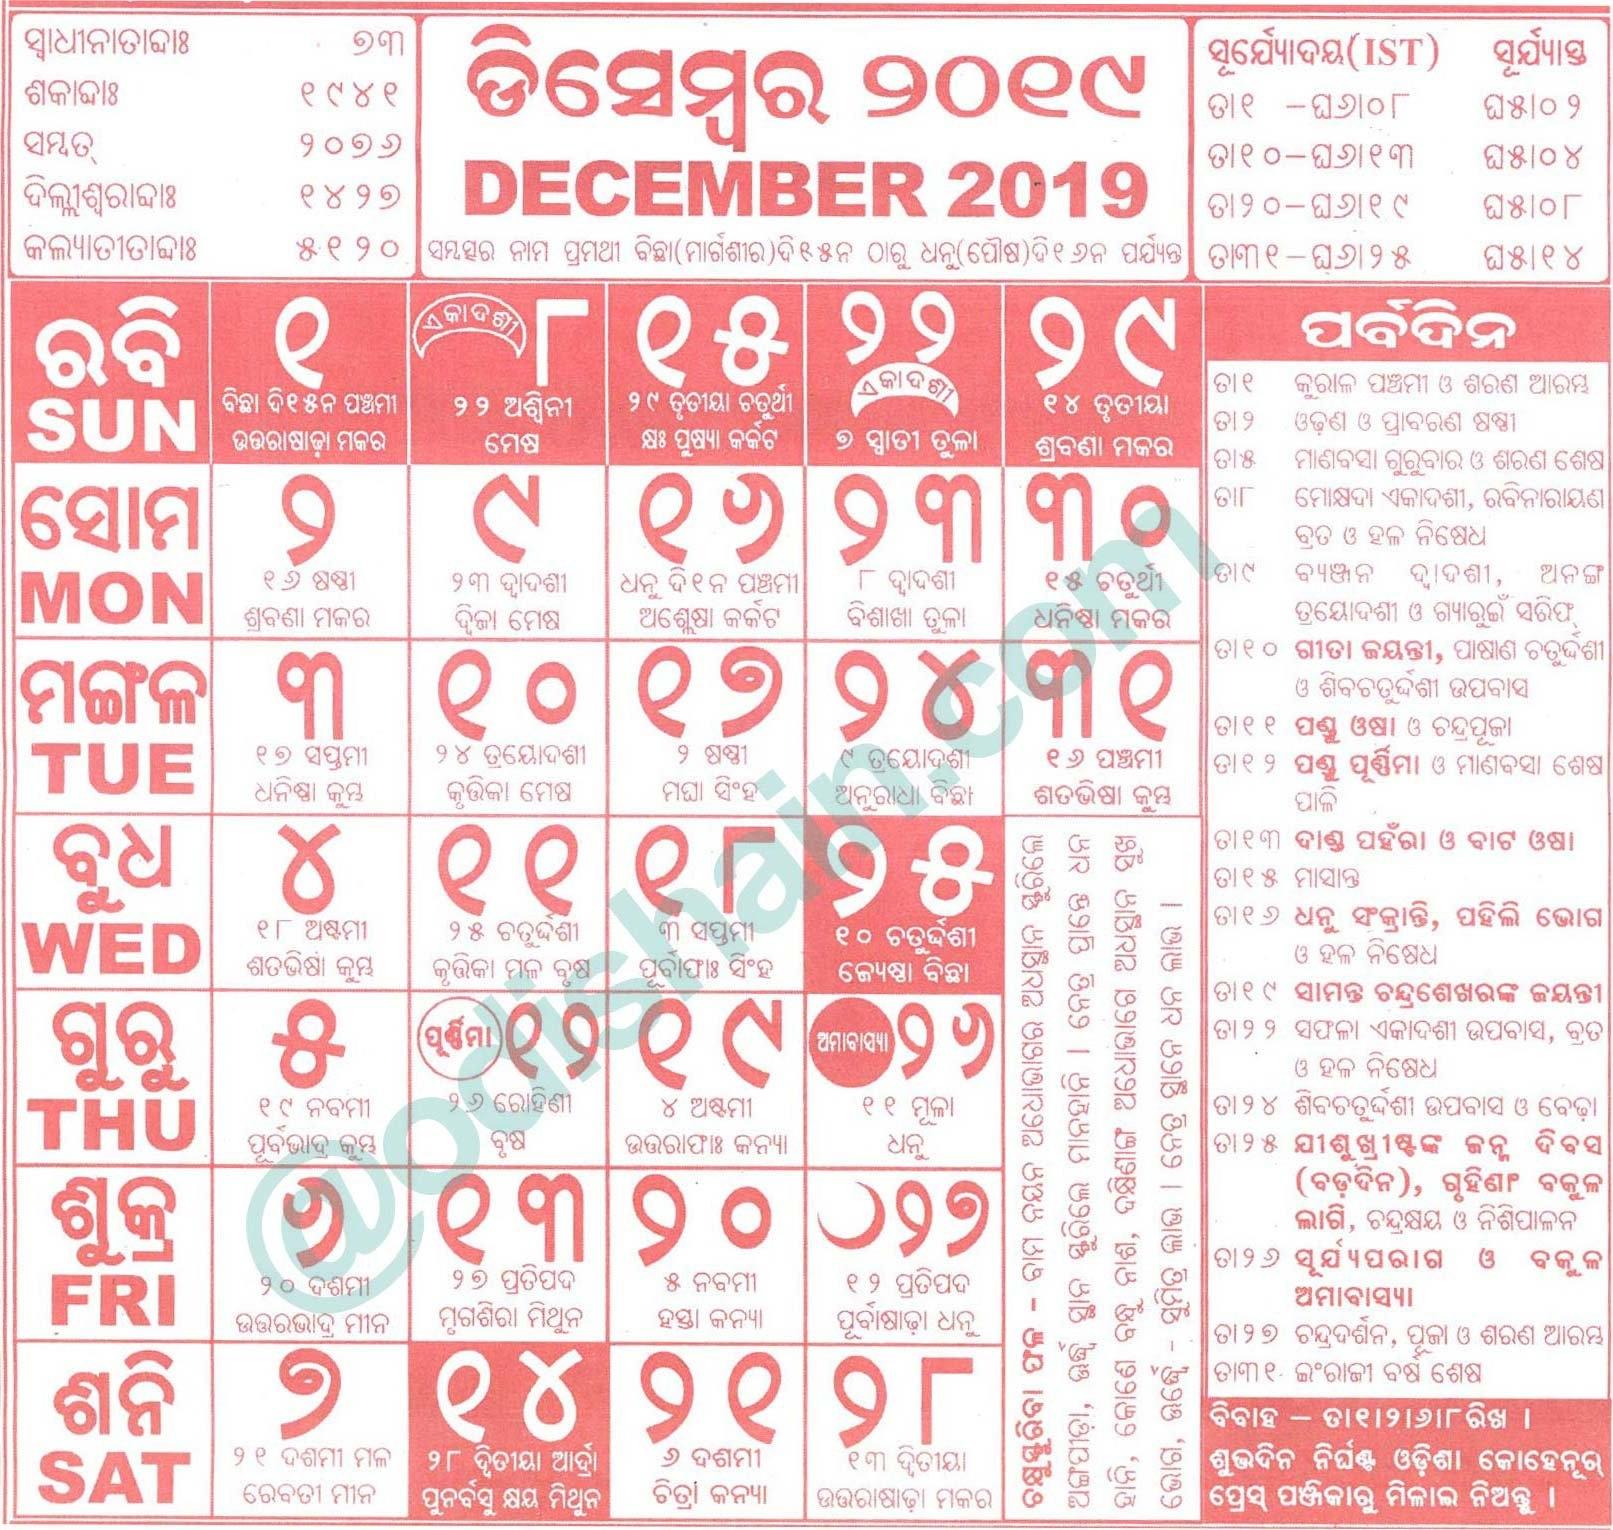 Odia Calendar 2019 December | Odishain Odia Calendar 2019